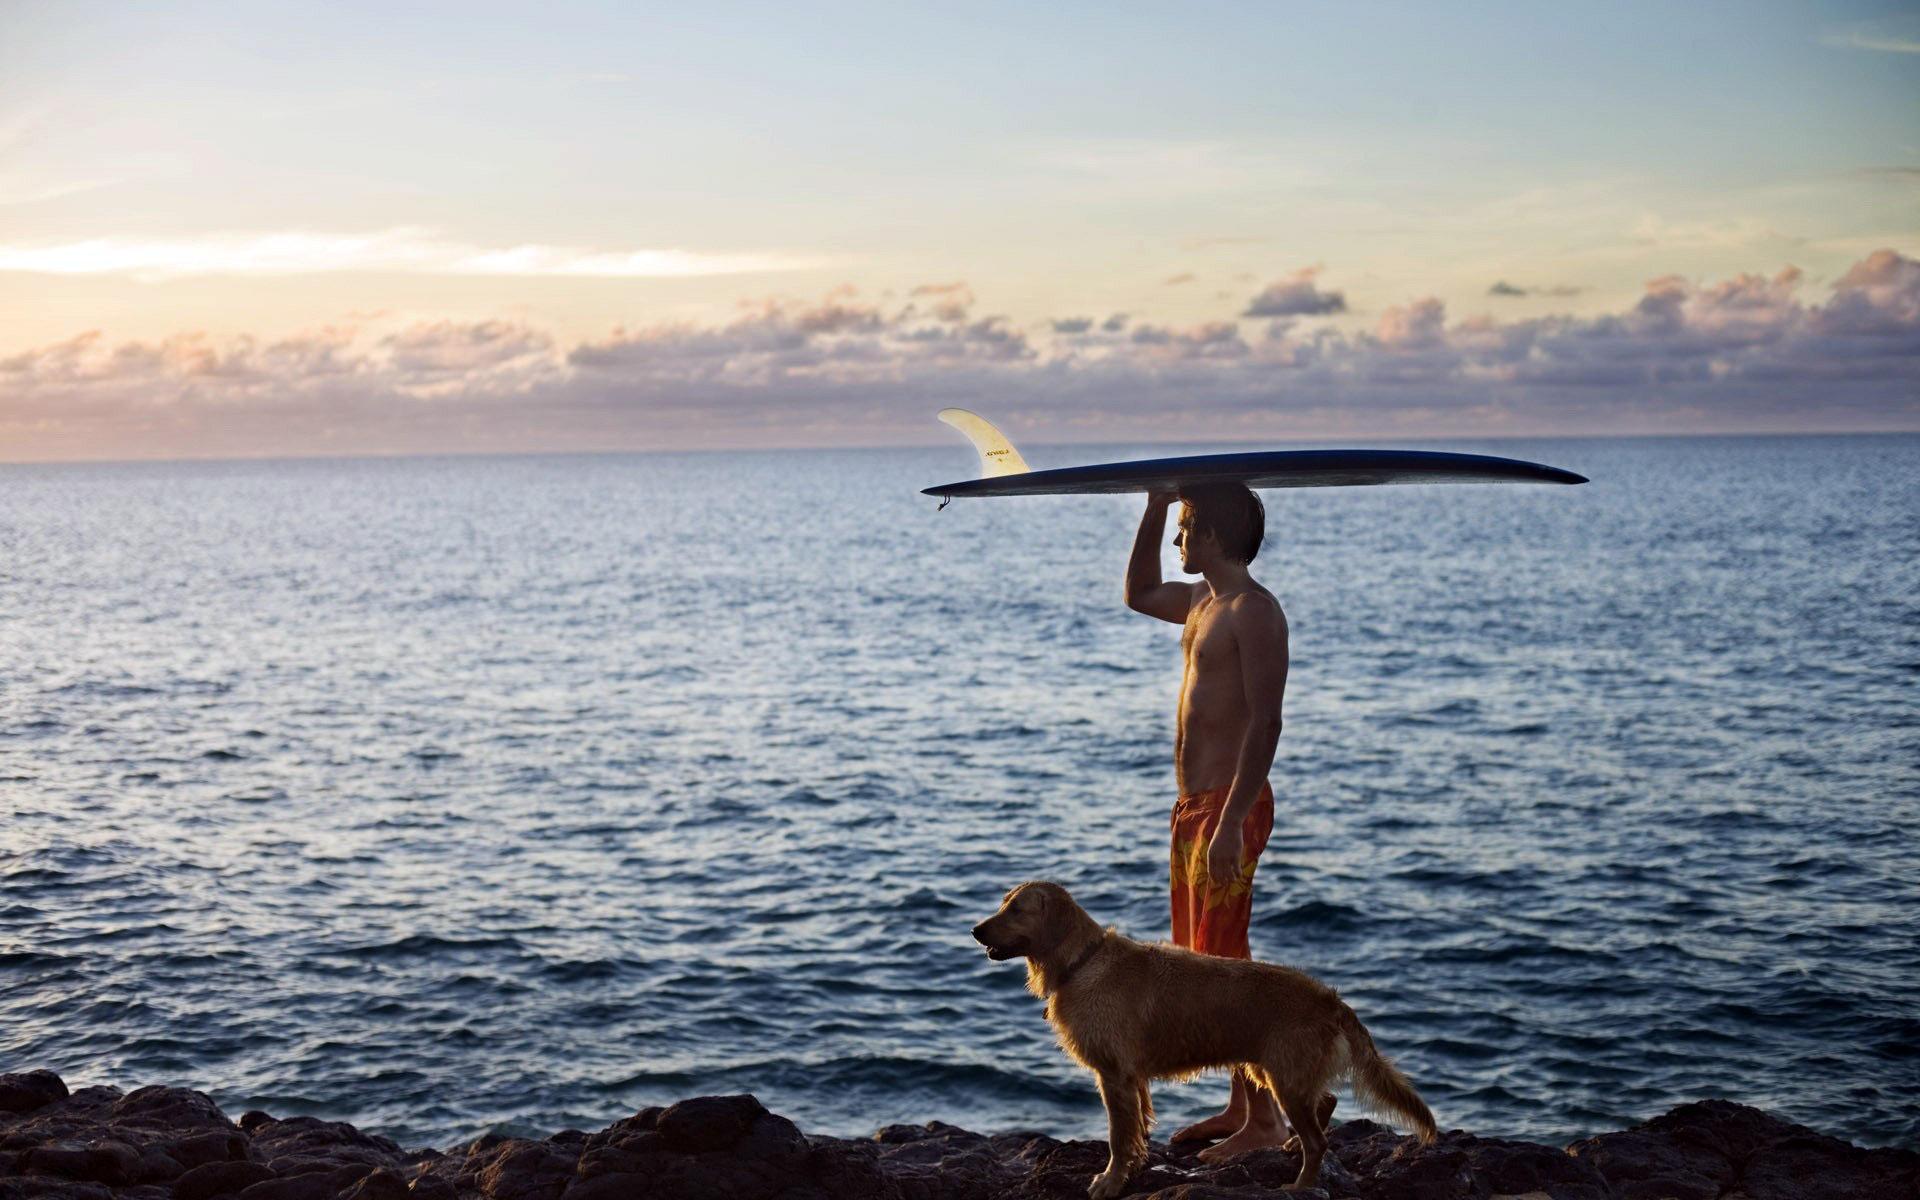 Surfboard Wallpapers Hd For Desktop Backgrounds